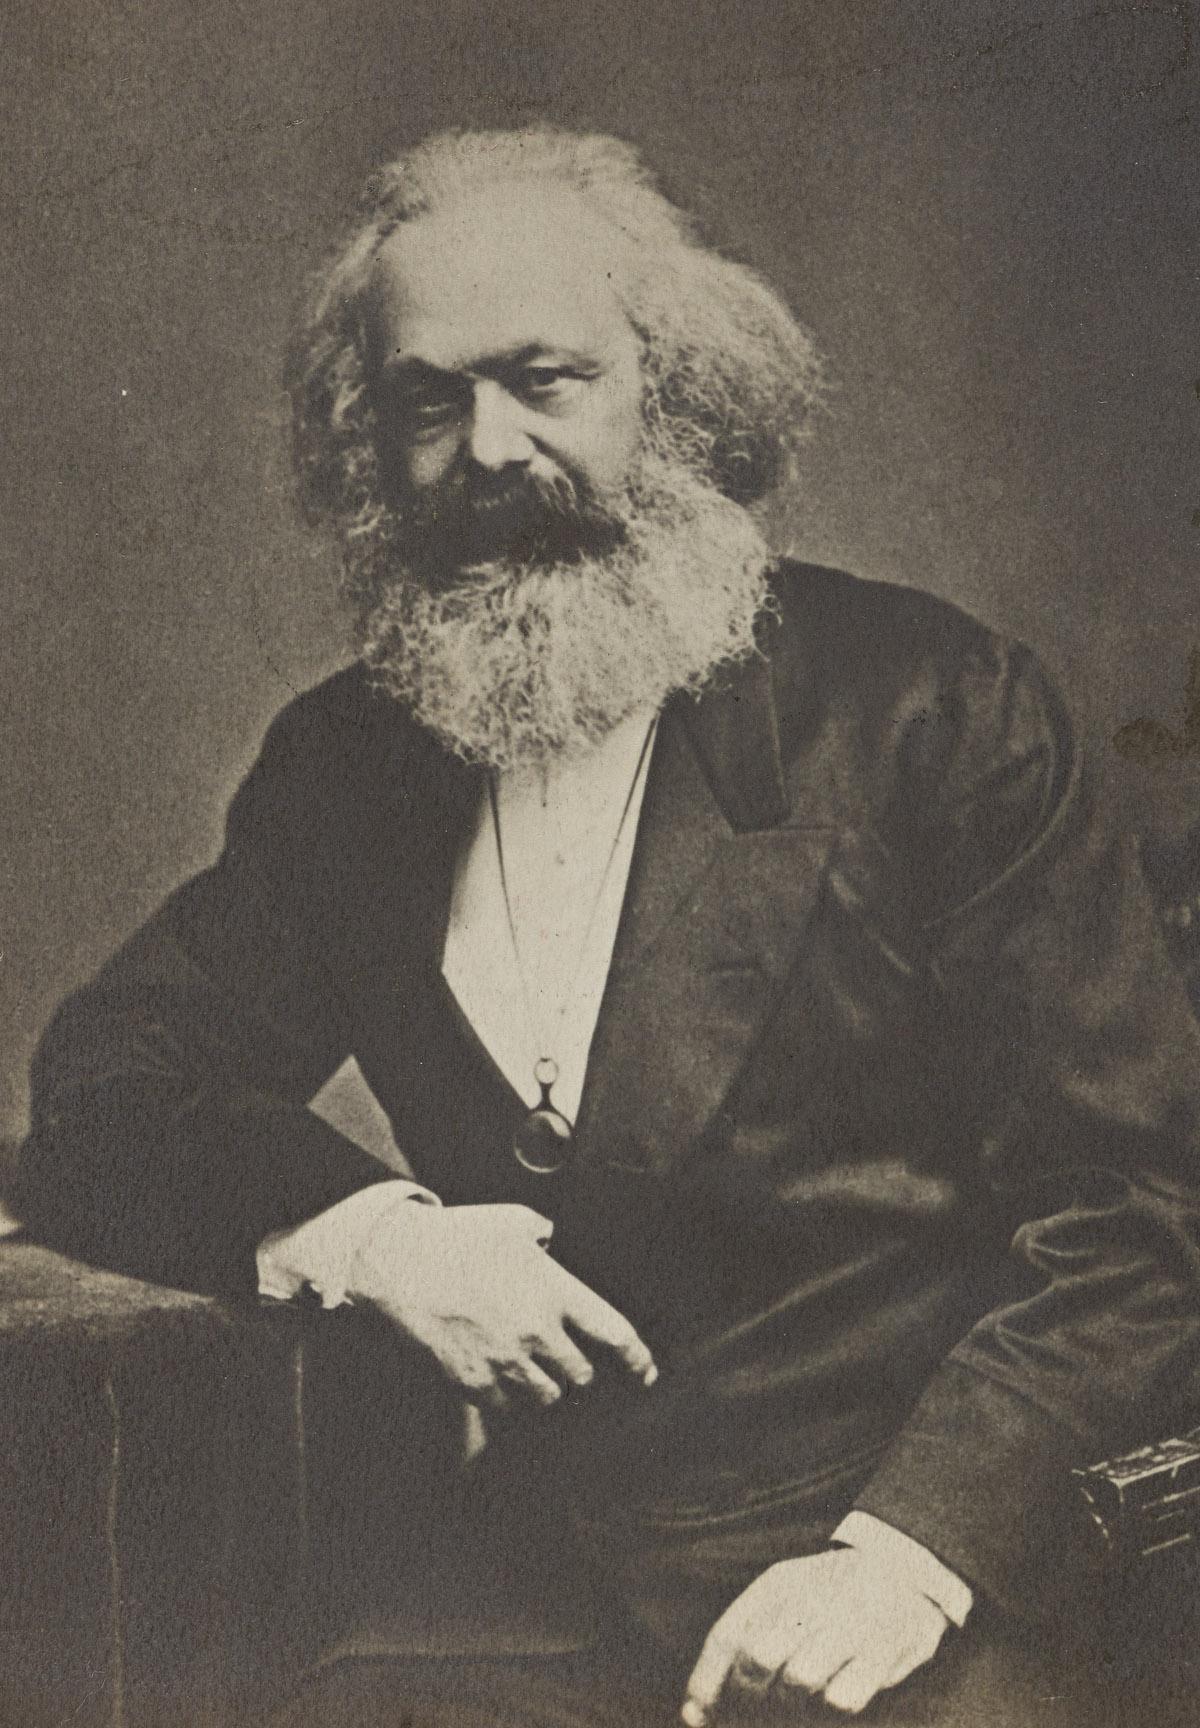 (COMMUNISM--ECONOMICS) Portrait of Karl Marx.